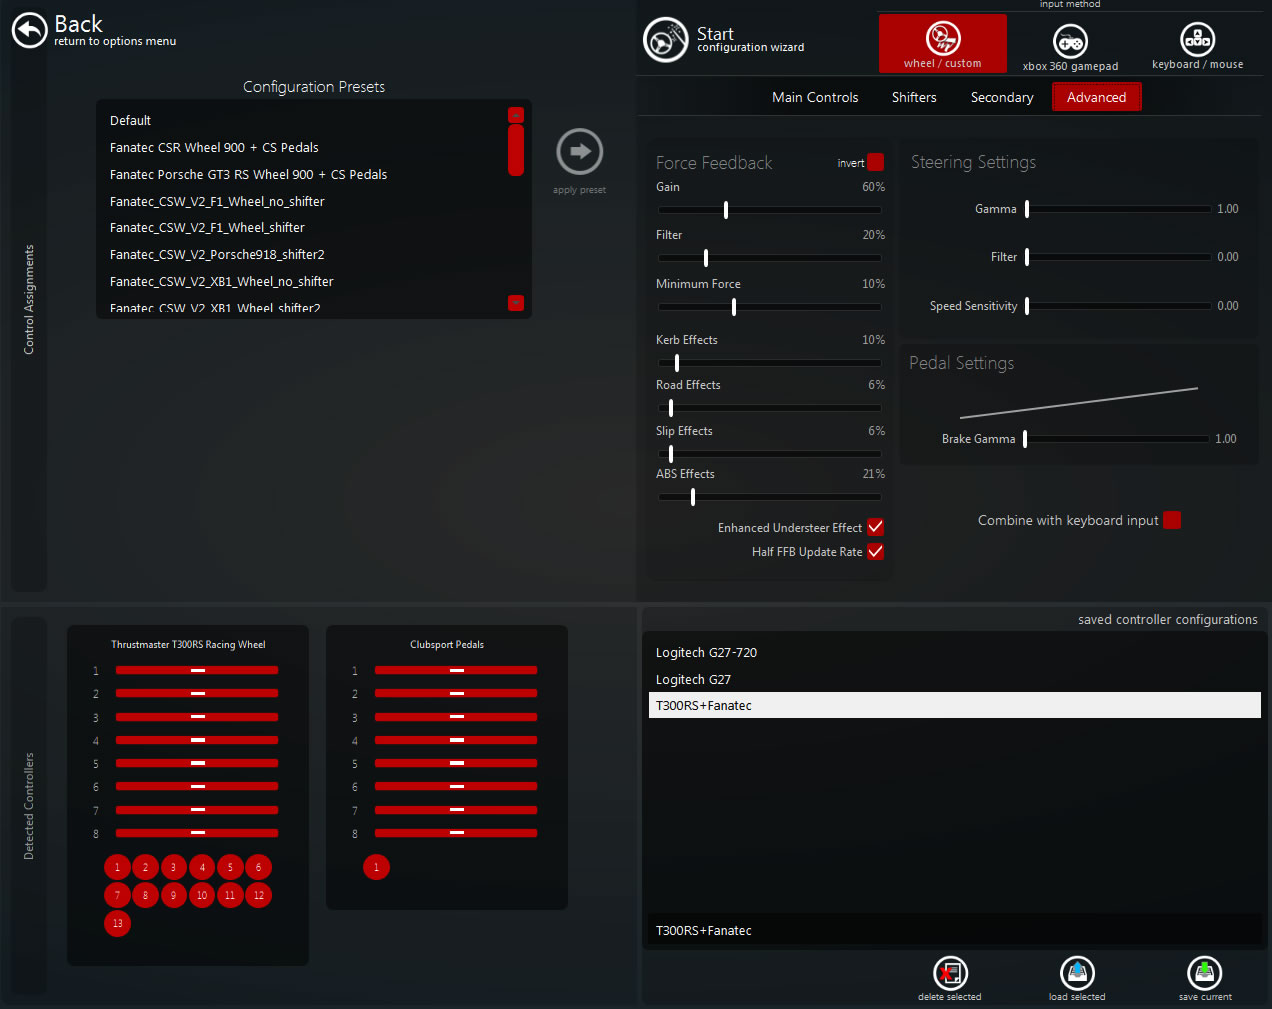 Assetto-Corsa-T300-control-settings-2.jpg